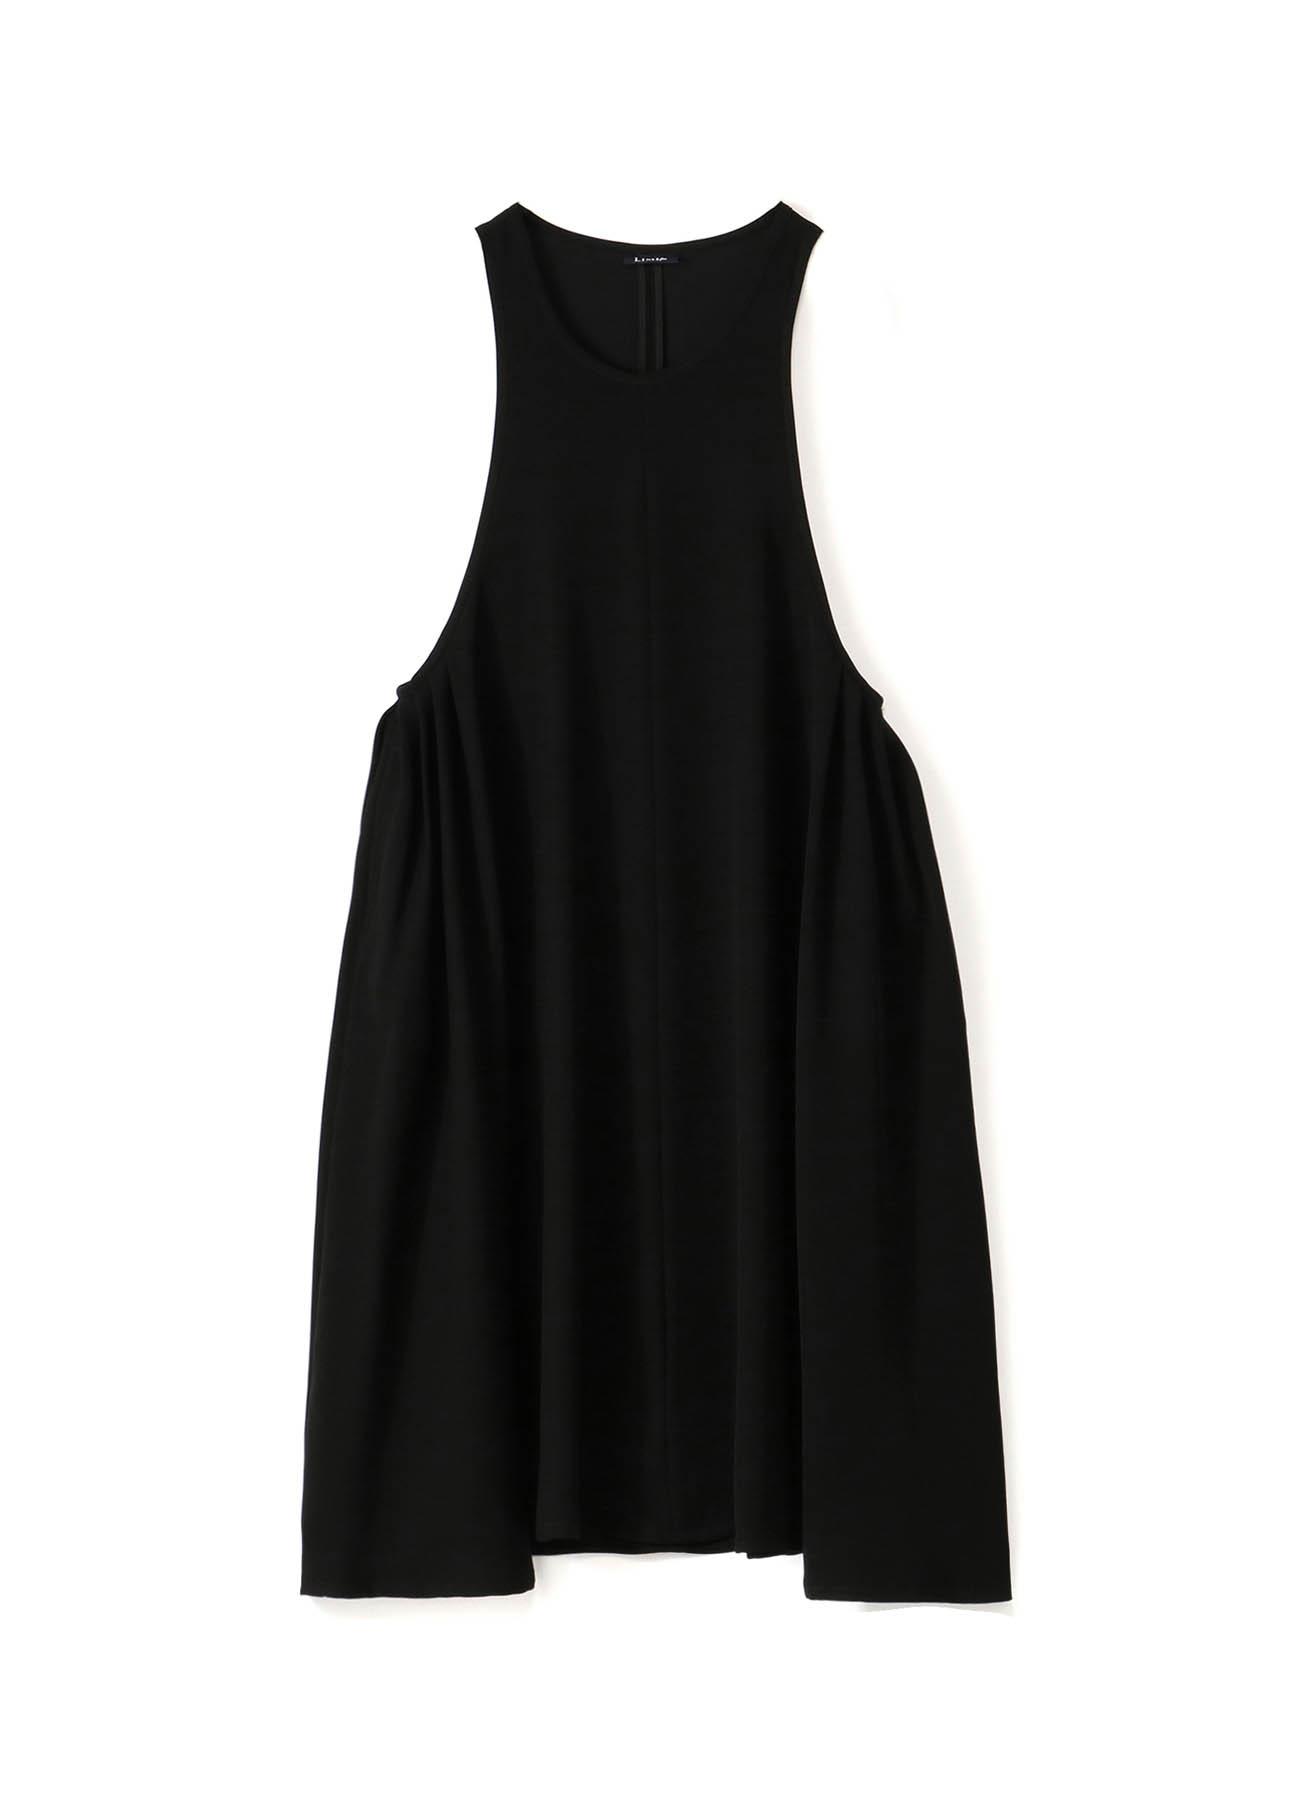 Double Satin Side Tuck Dress